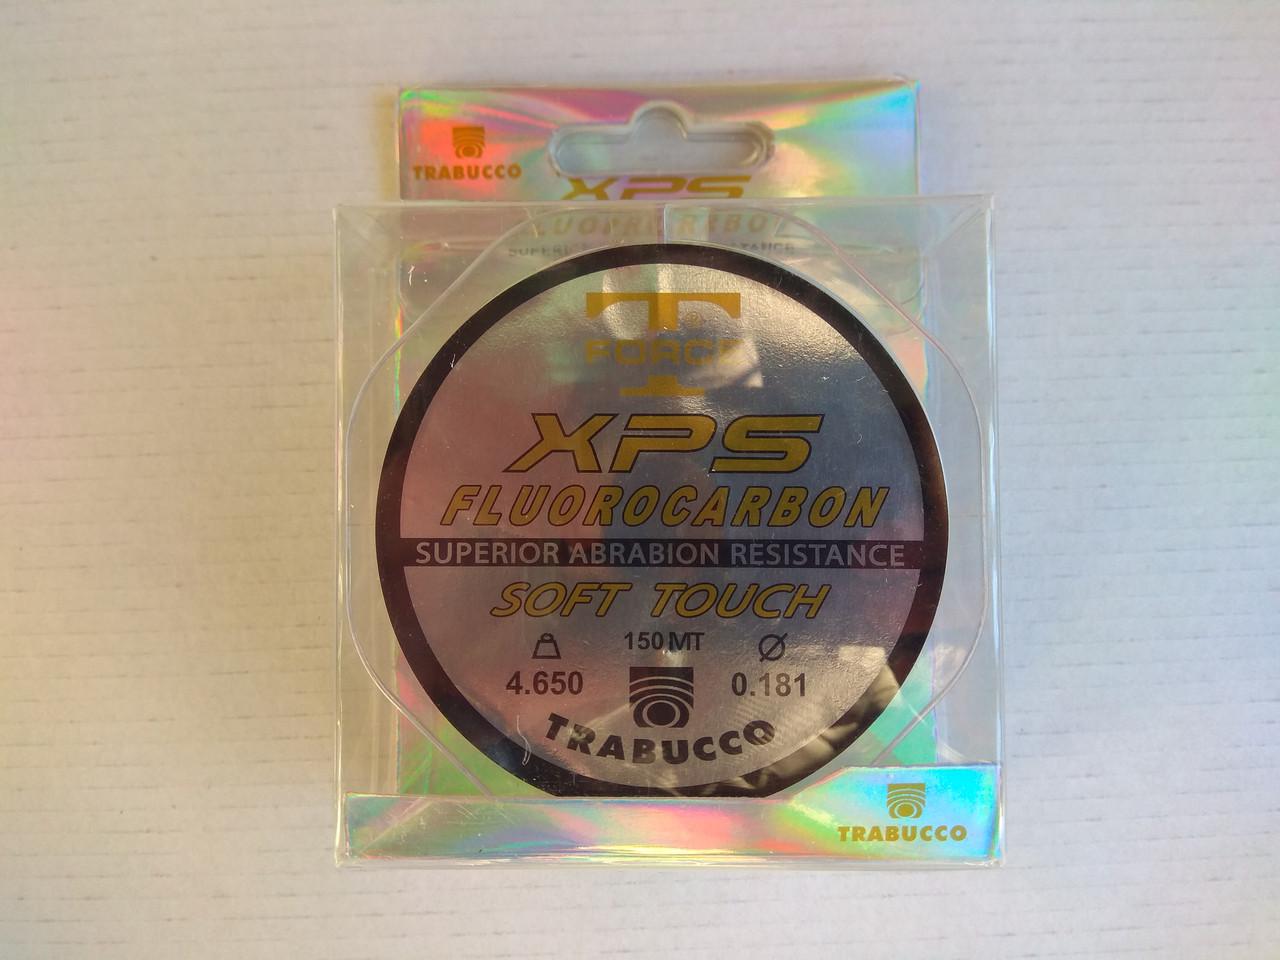 Леска Trabucco XPS Fluorocarbon 150m 0.35